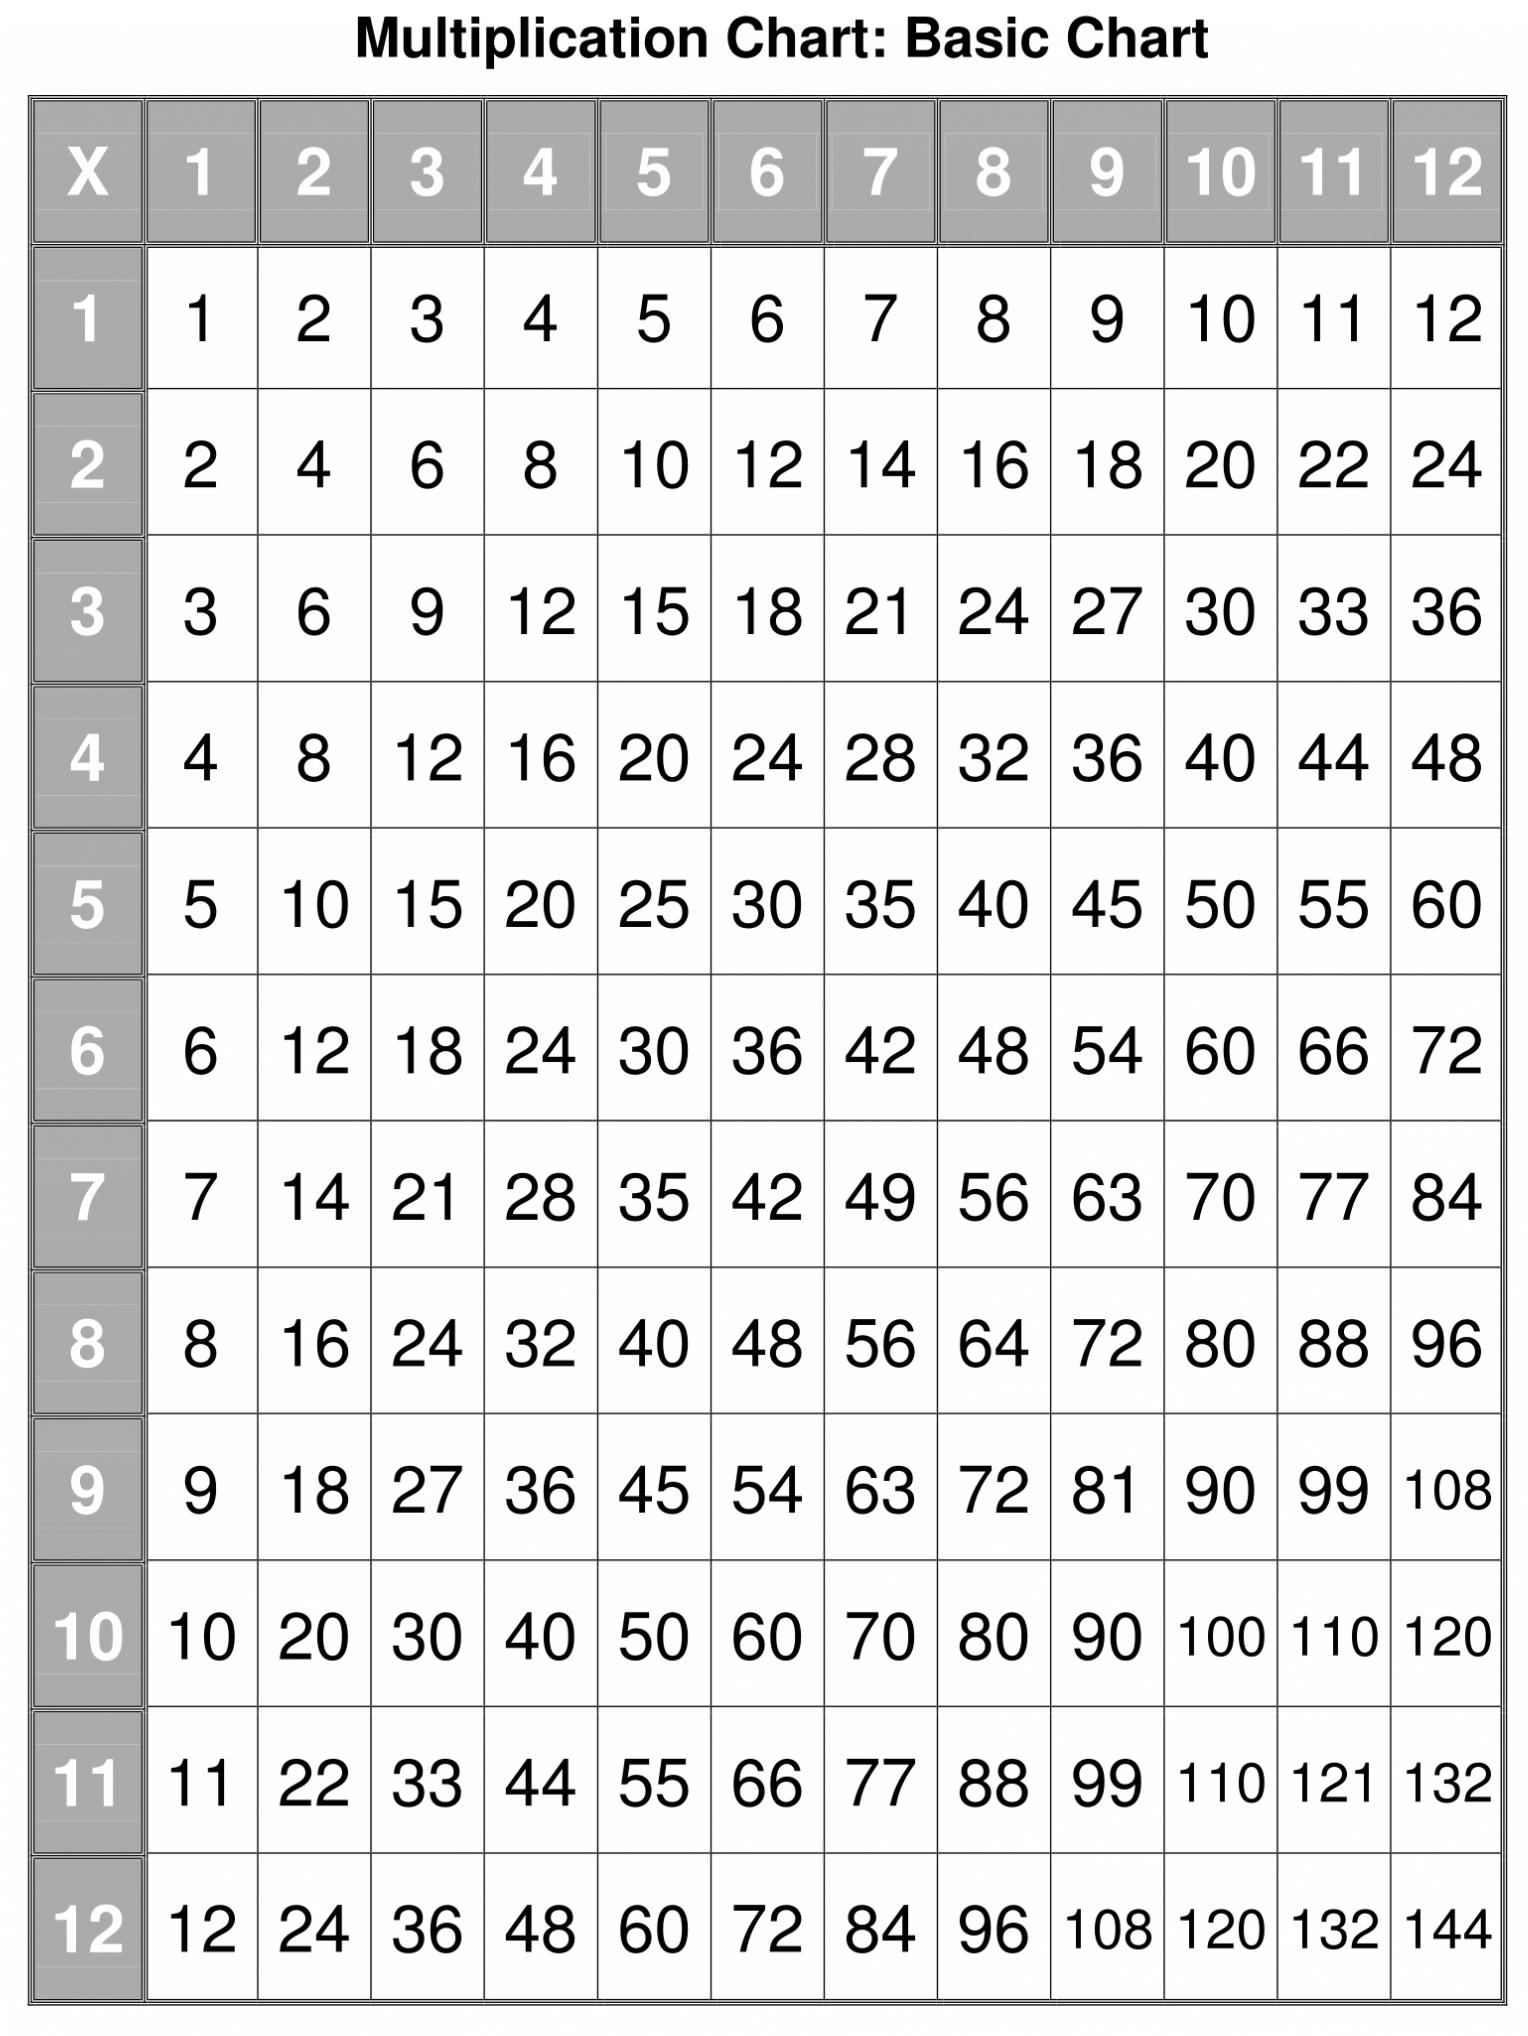 Printable Multiplication Table Pdf | Multiplication Charts within Printable Multiplication Chart Pdf